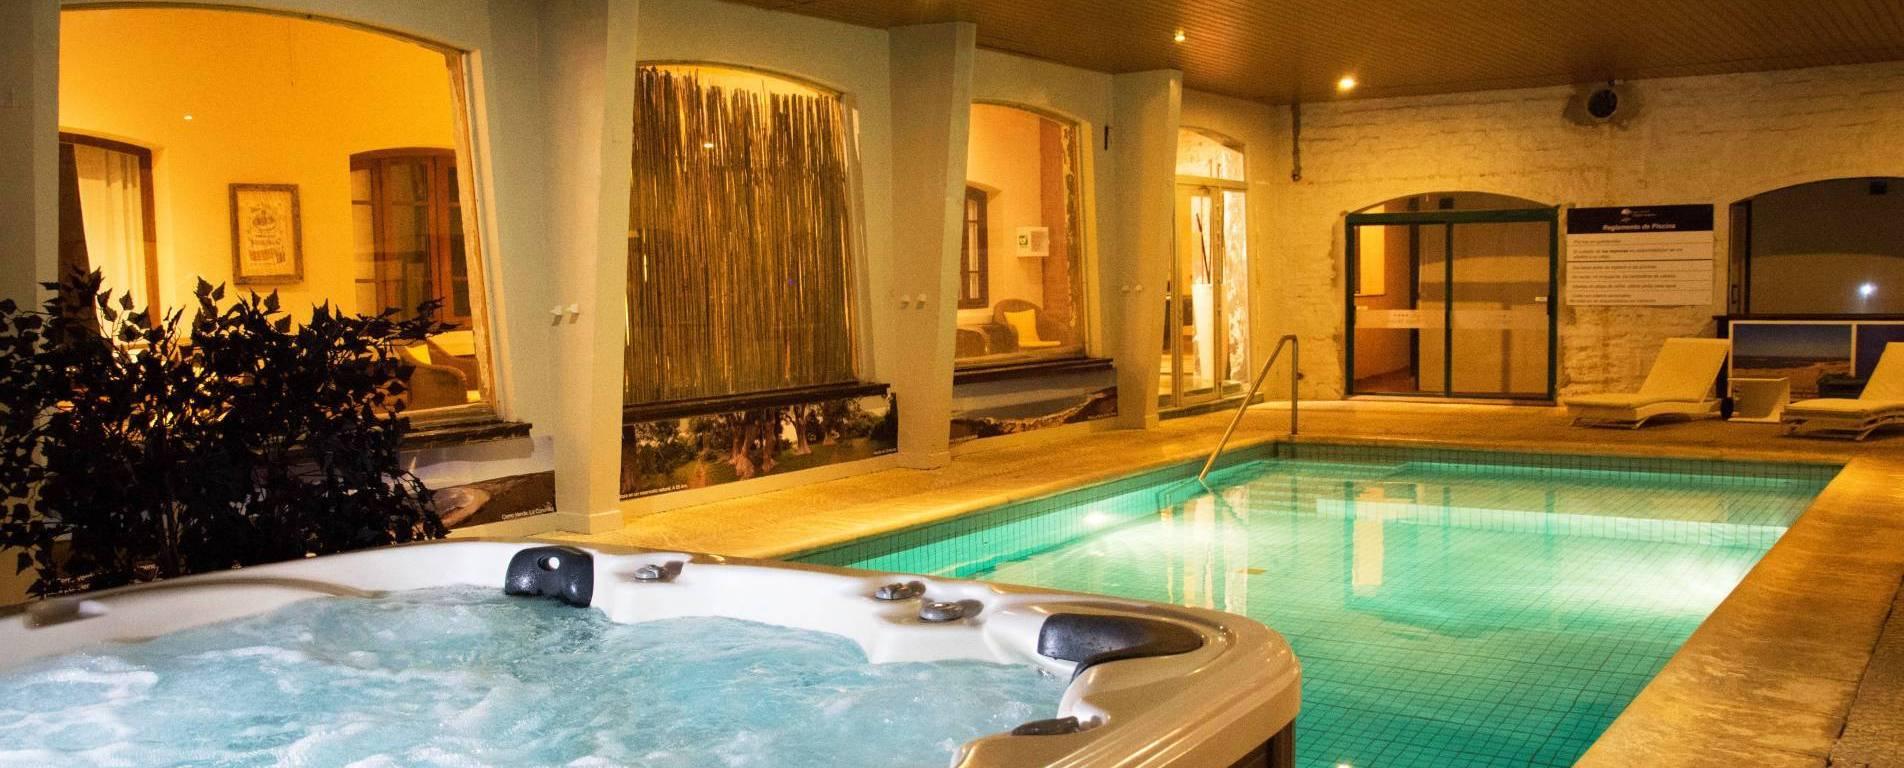 Piscina climatizada en Hotel Parque Oceánico en Rocha